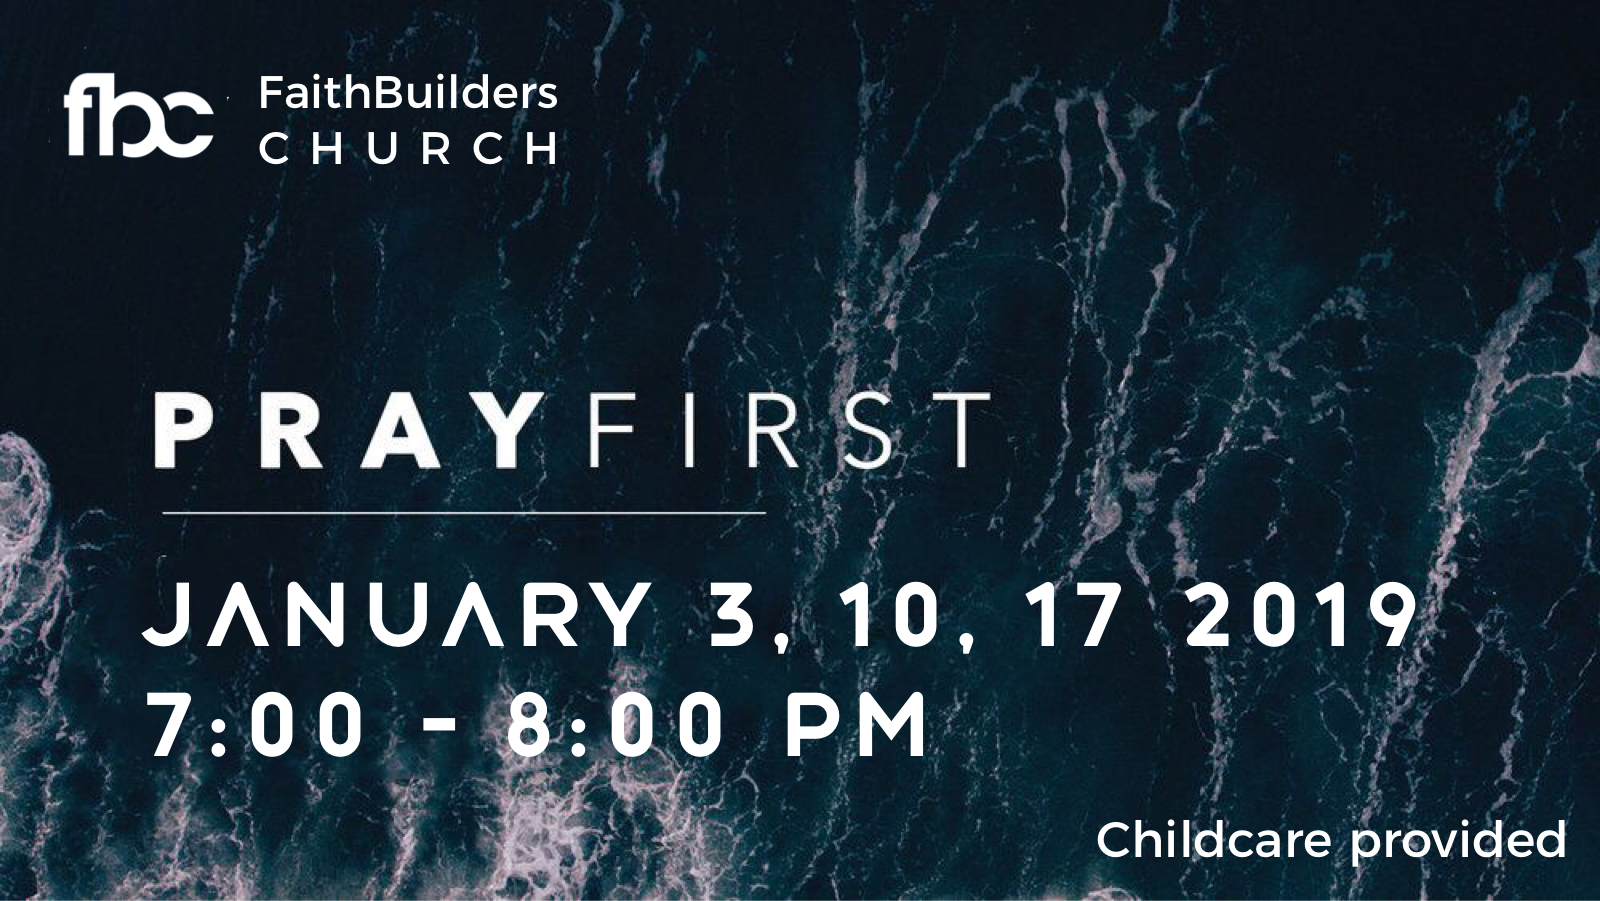 Corporate Prayer - Thursday, January 10th 78:00 pm